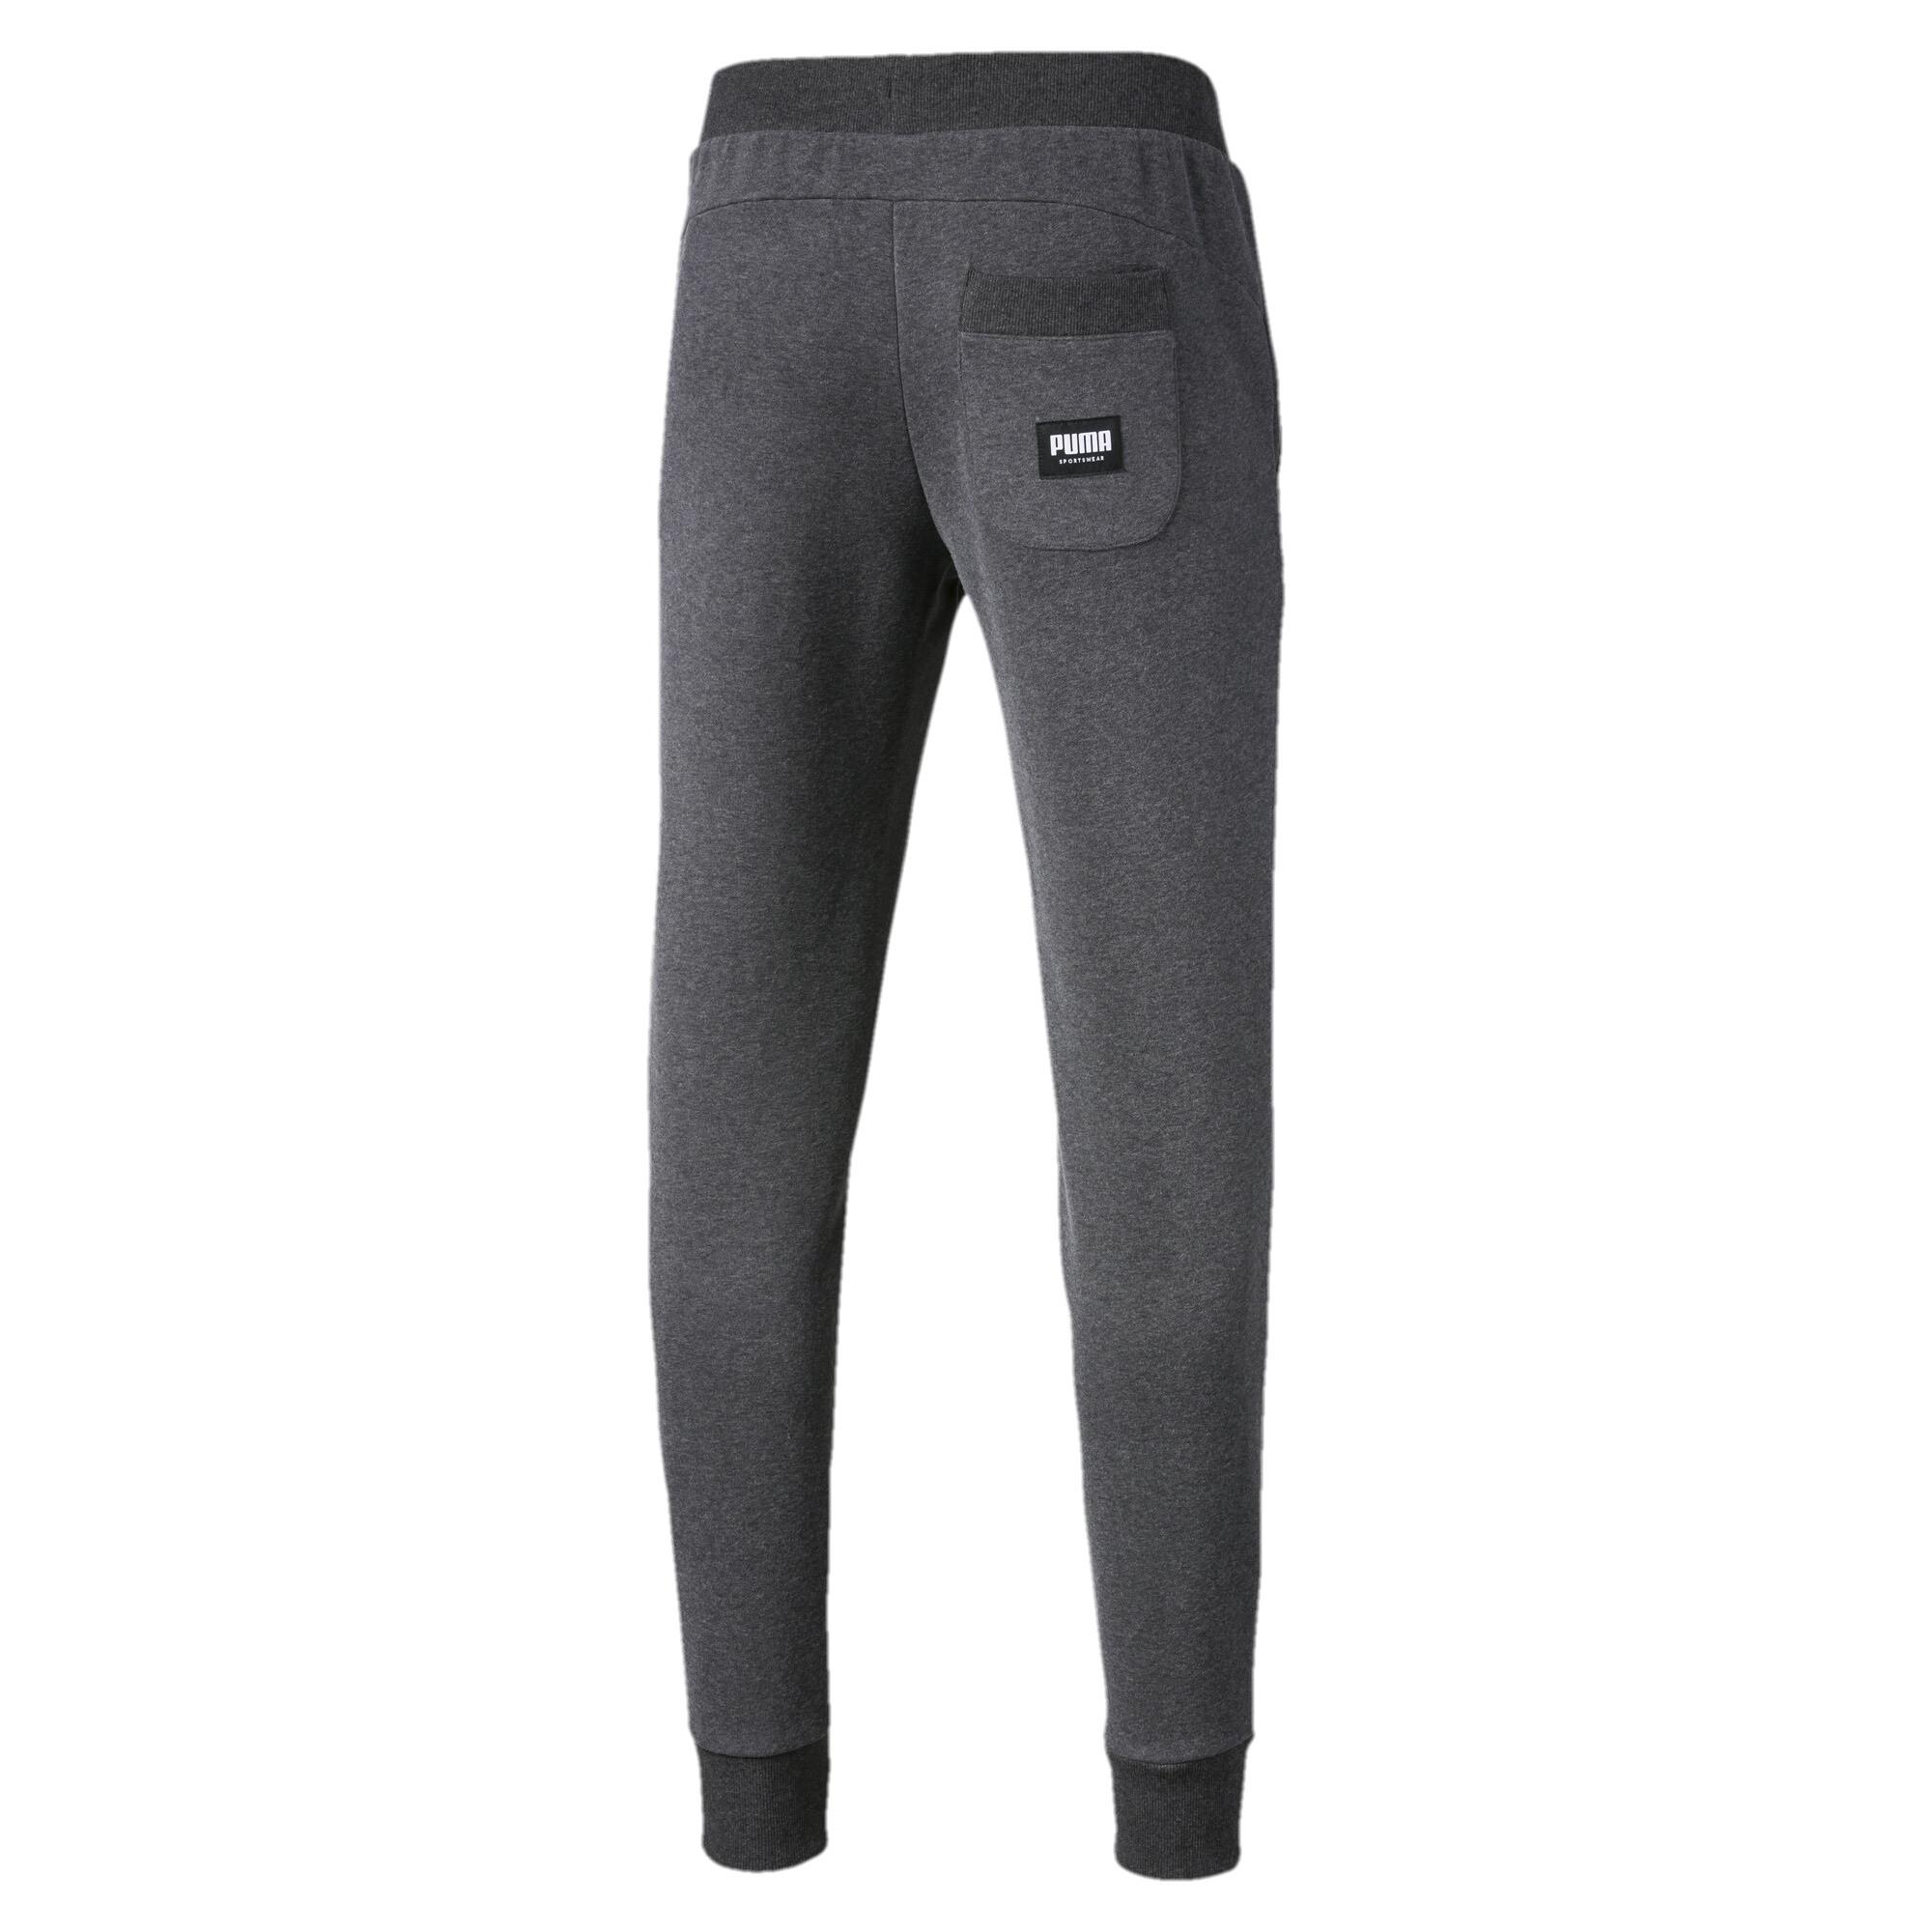 PUMA-Athletics-Men-039-s-Fleece-Pants-Men-Knitted-Pants-Basics thumbnail 3